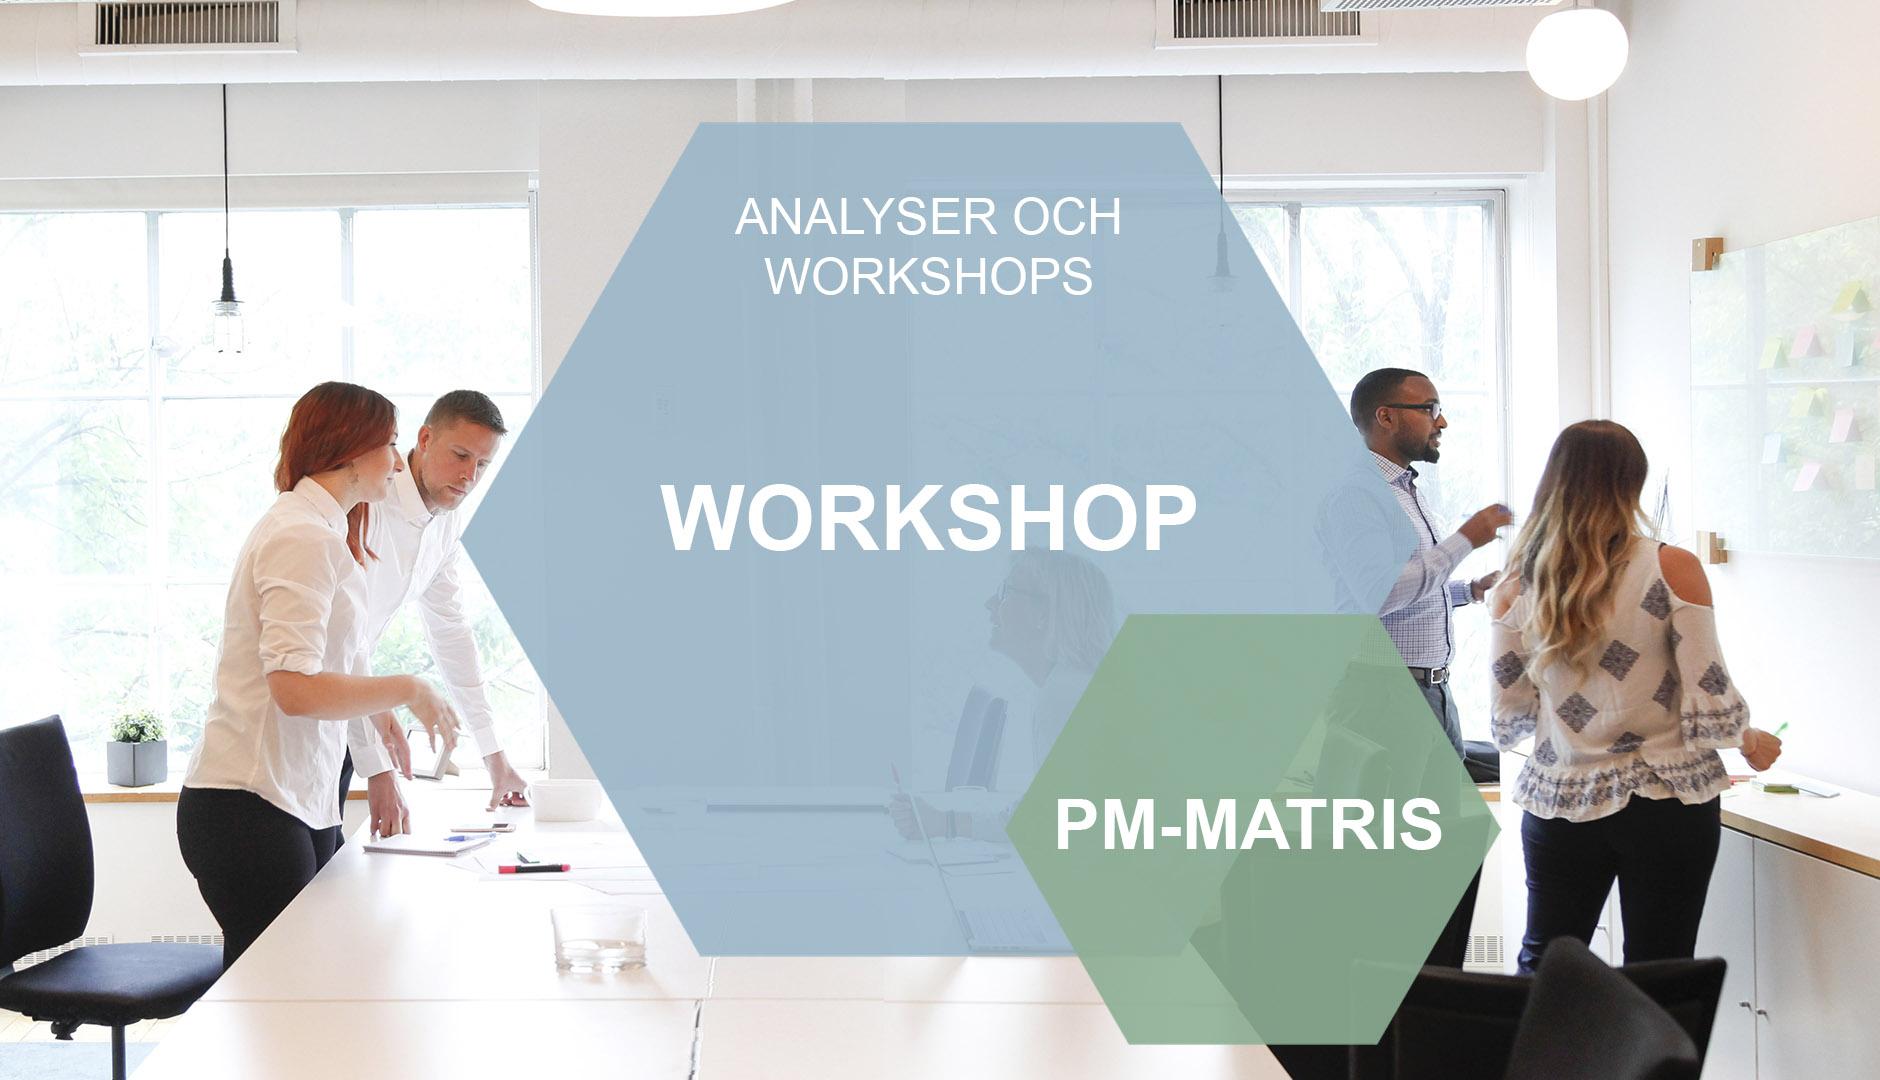 PM-matris workshop i hexagon mot bakgrund av människor som workshoppar